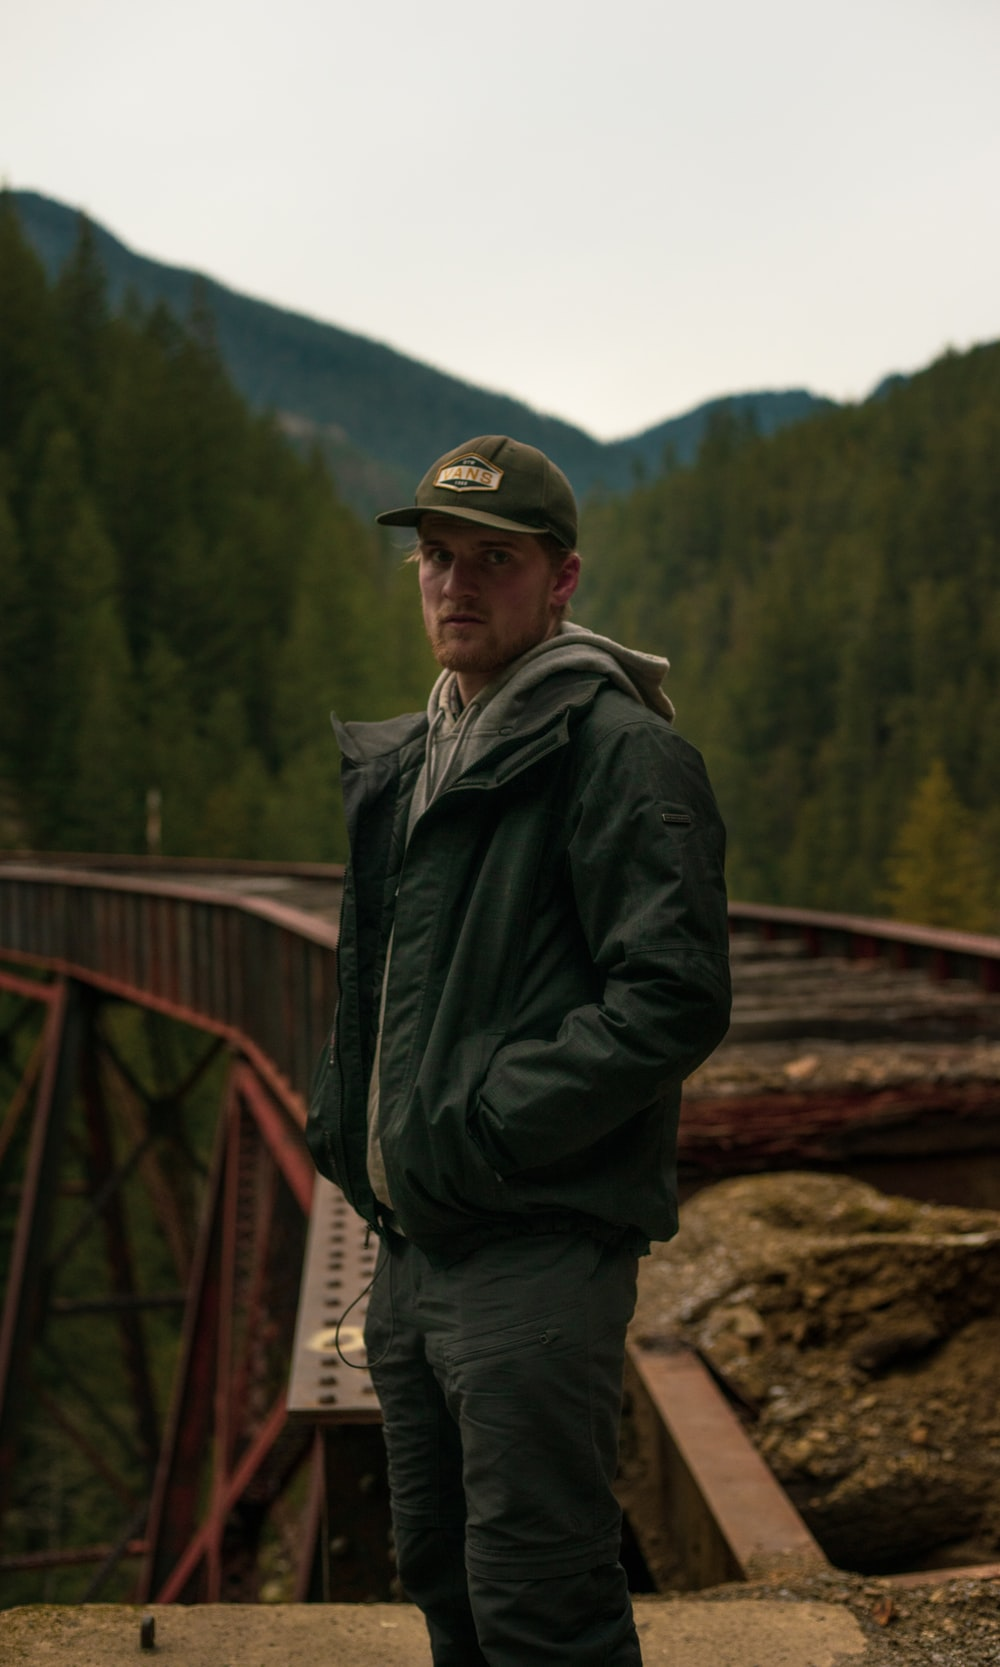 man in black jacket standing on brown rock during daytime